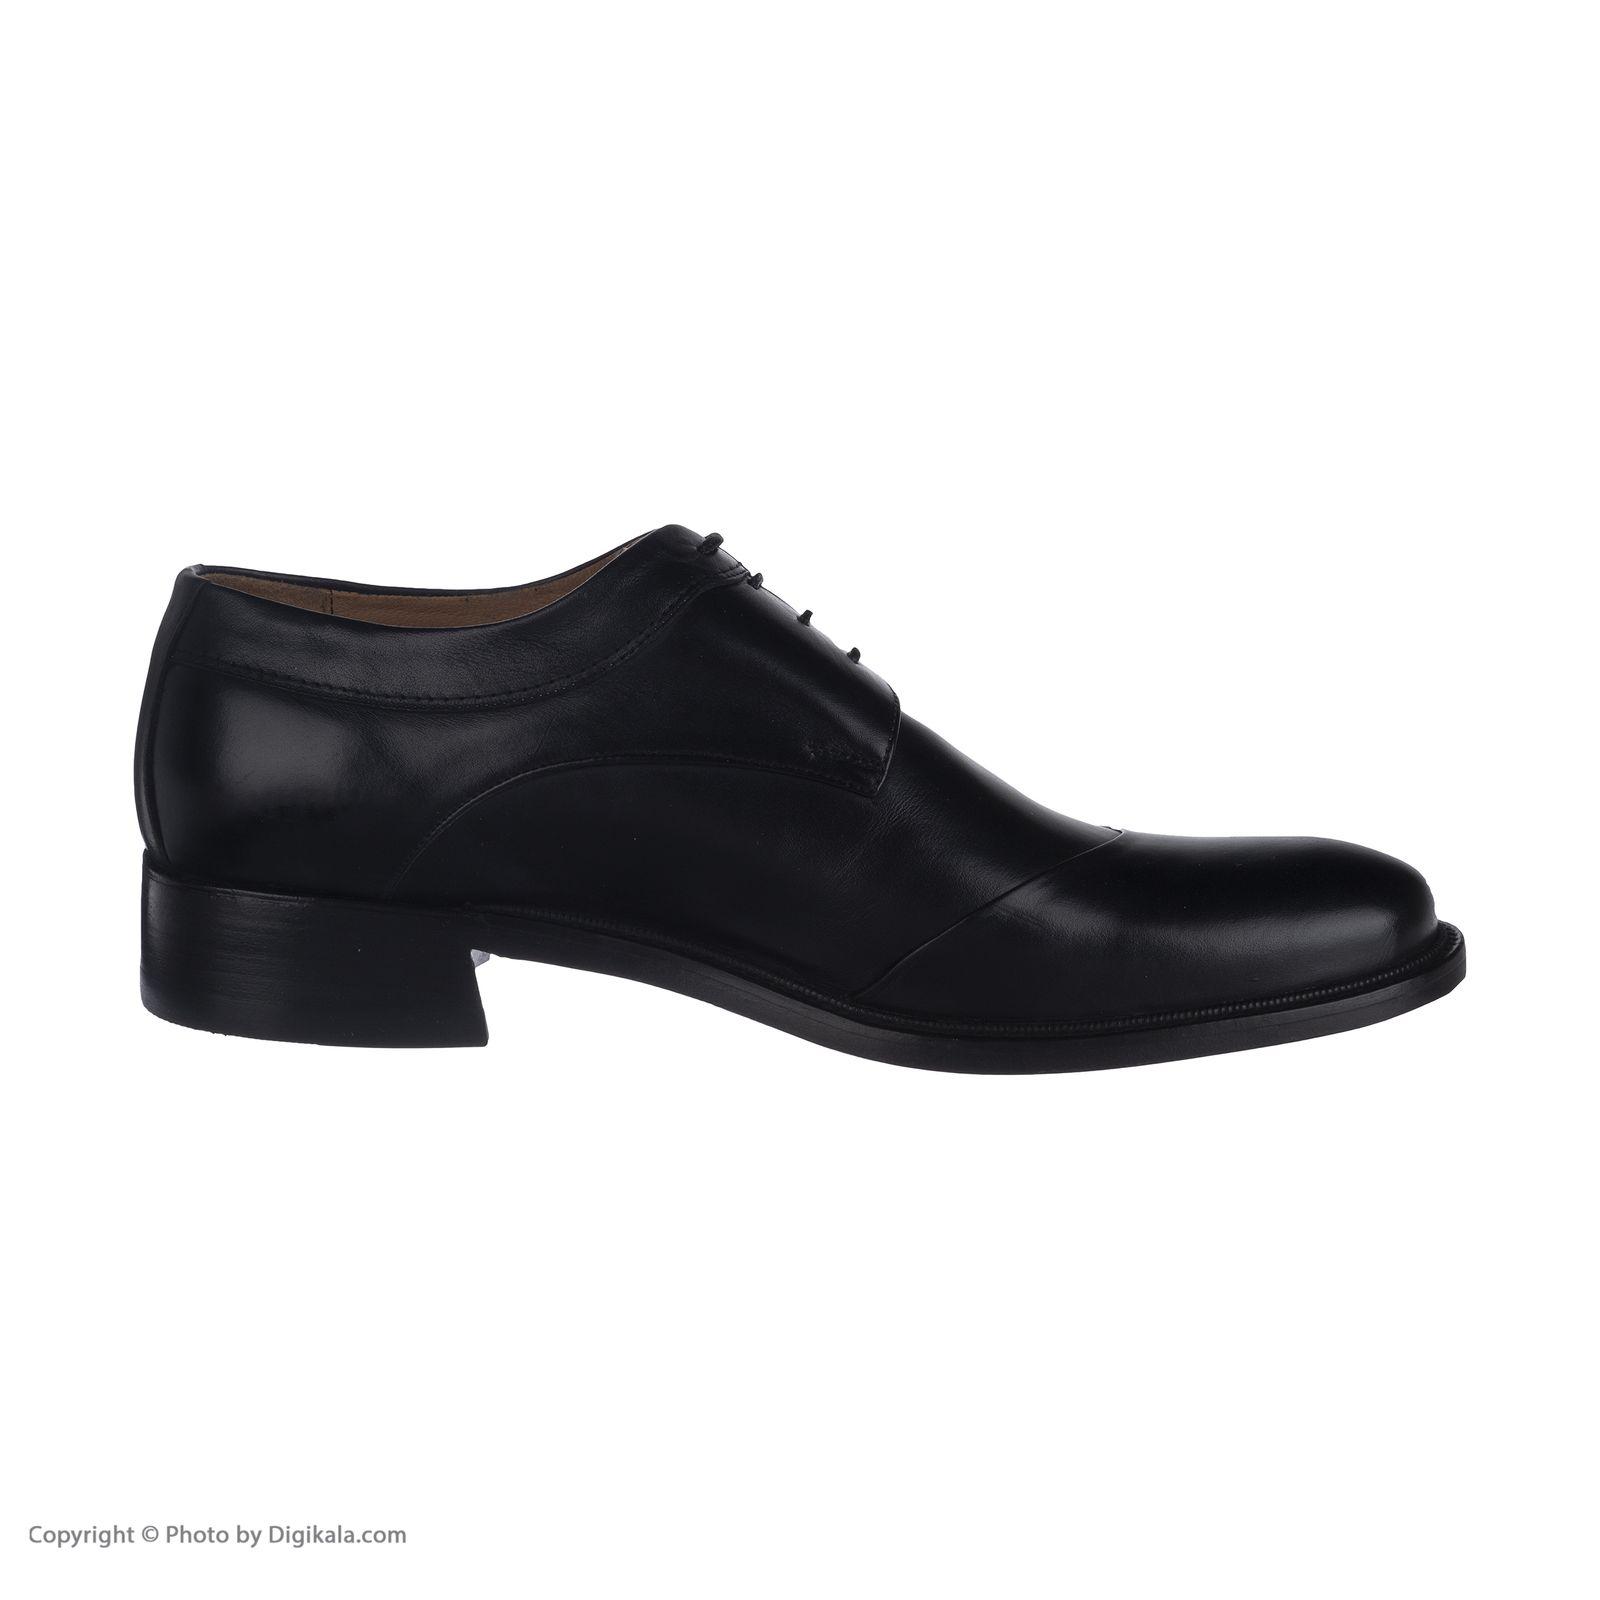 کفش مردانه نظری کد 423 -  - 5